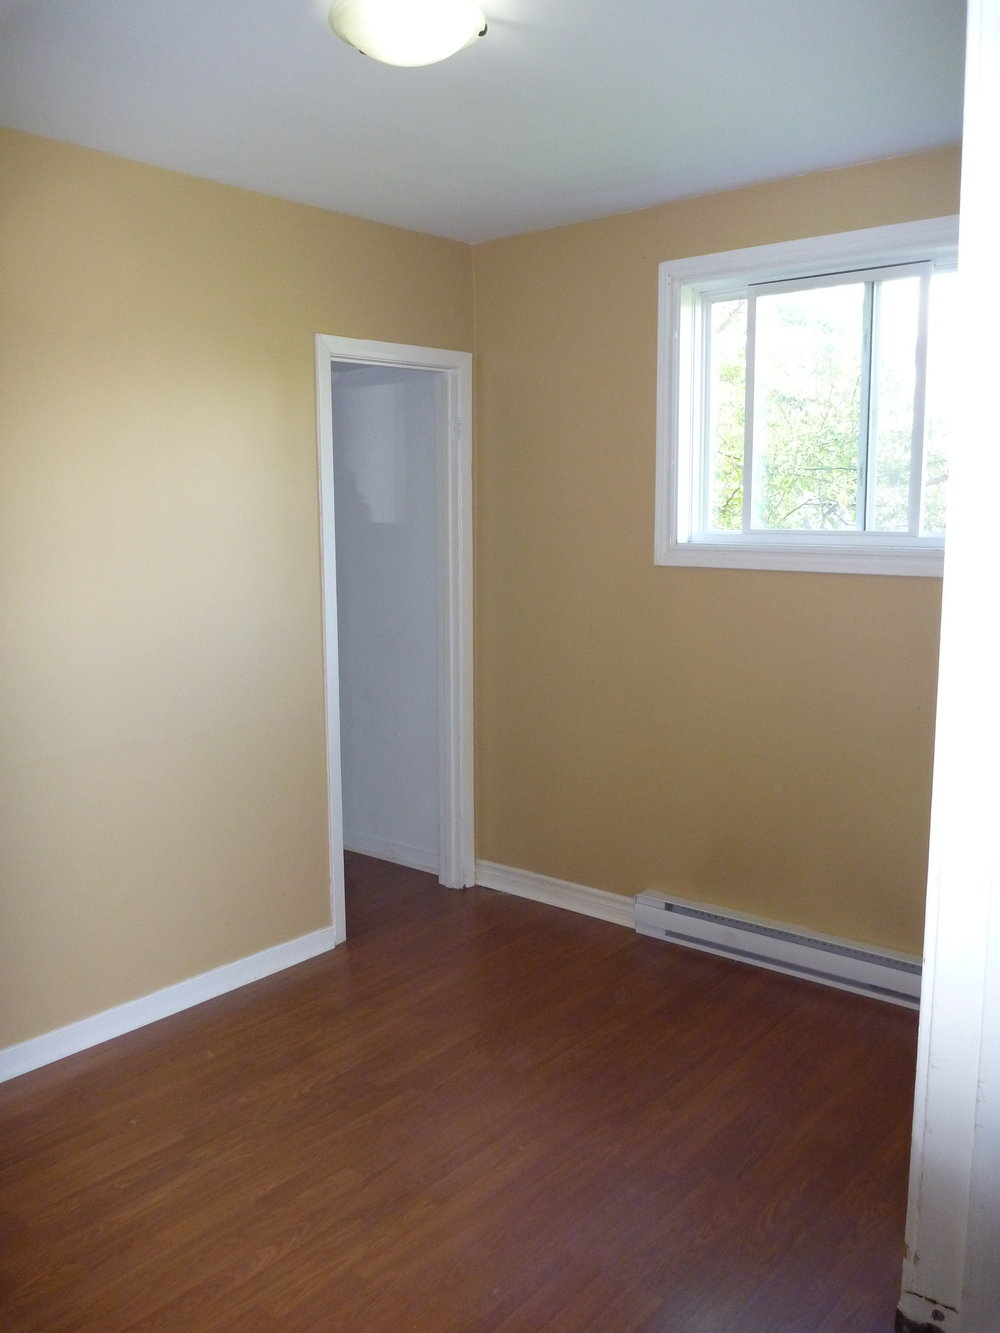 15.Bedroom 1.JPG